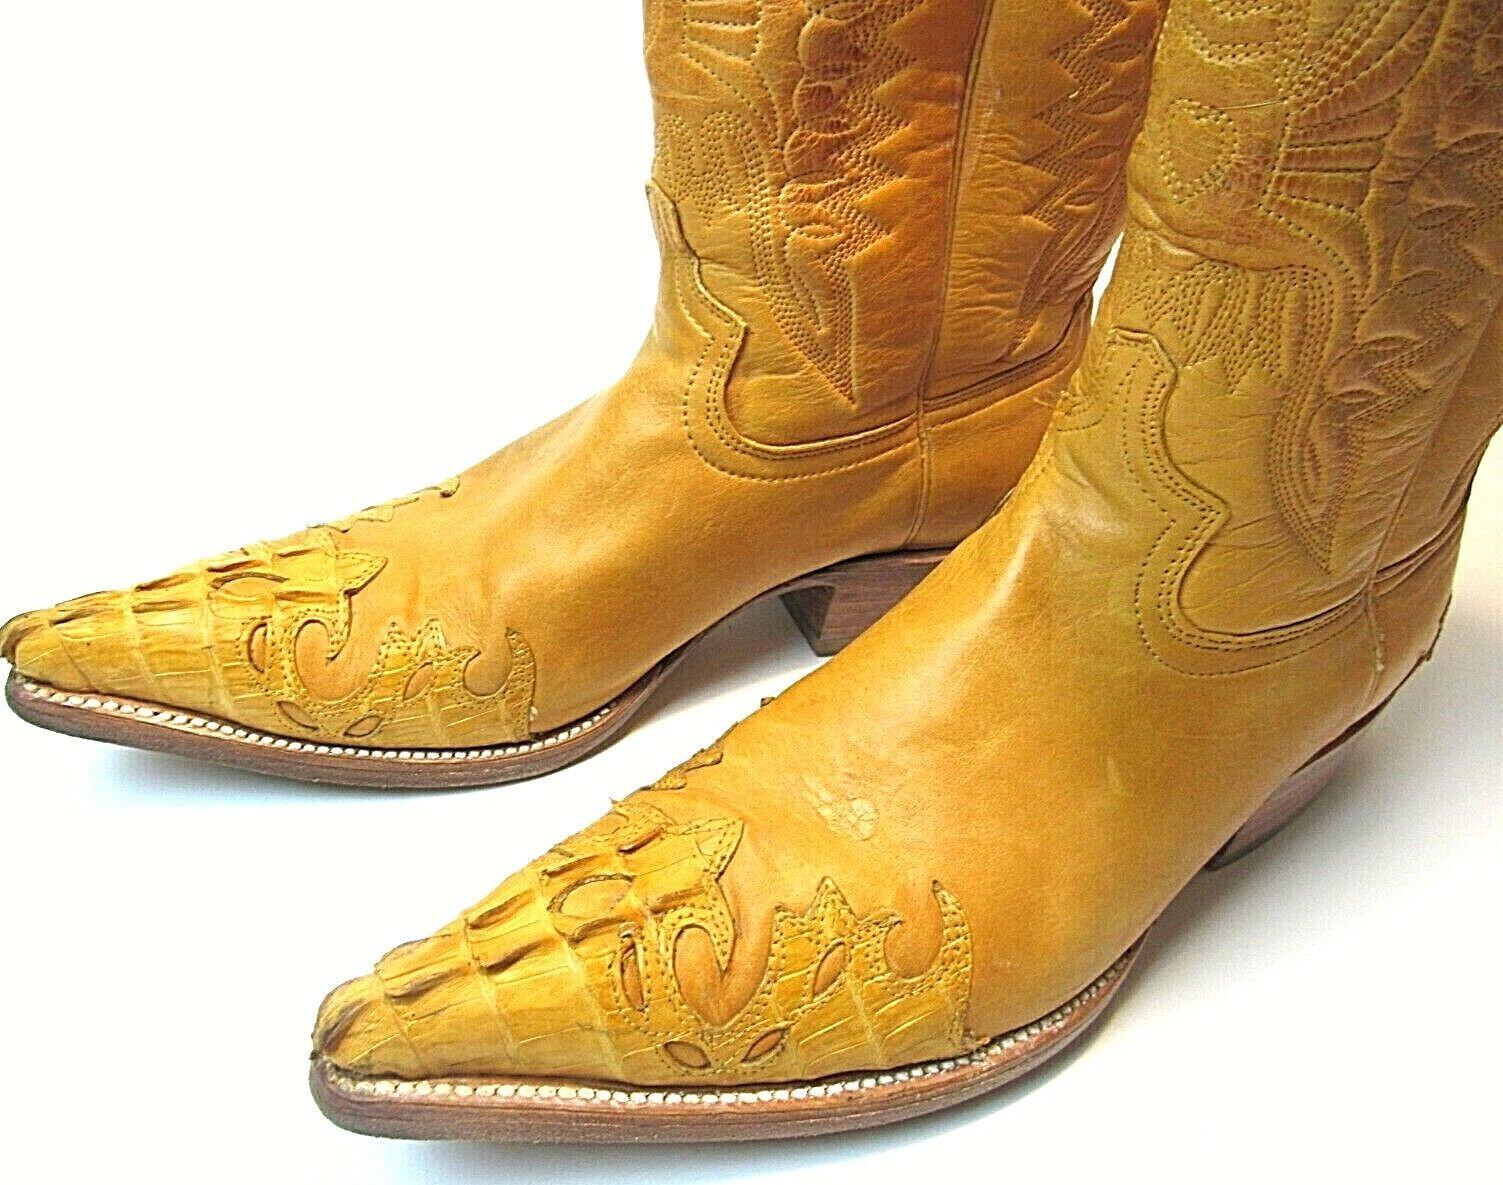 VTG EL GENERAAL Exotische Cowboy laarzen mannen's 8.5 --9 mantequilla Ostrich Caiman